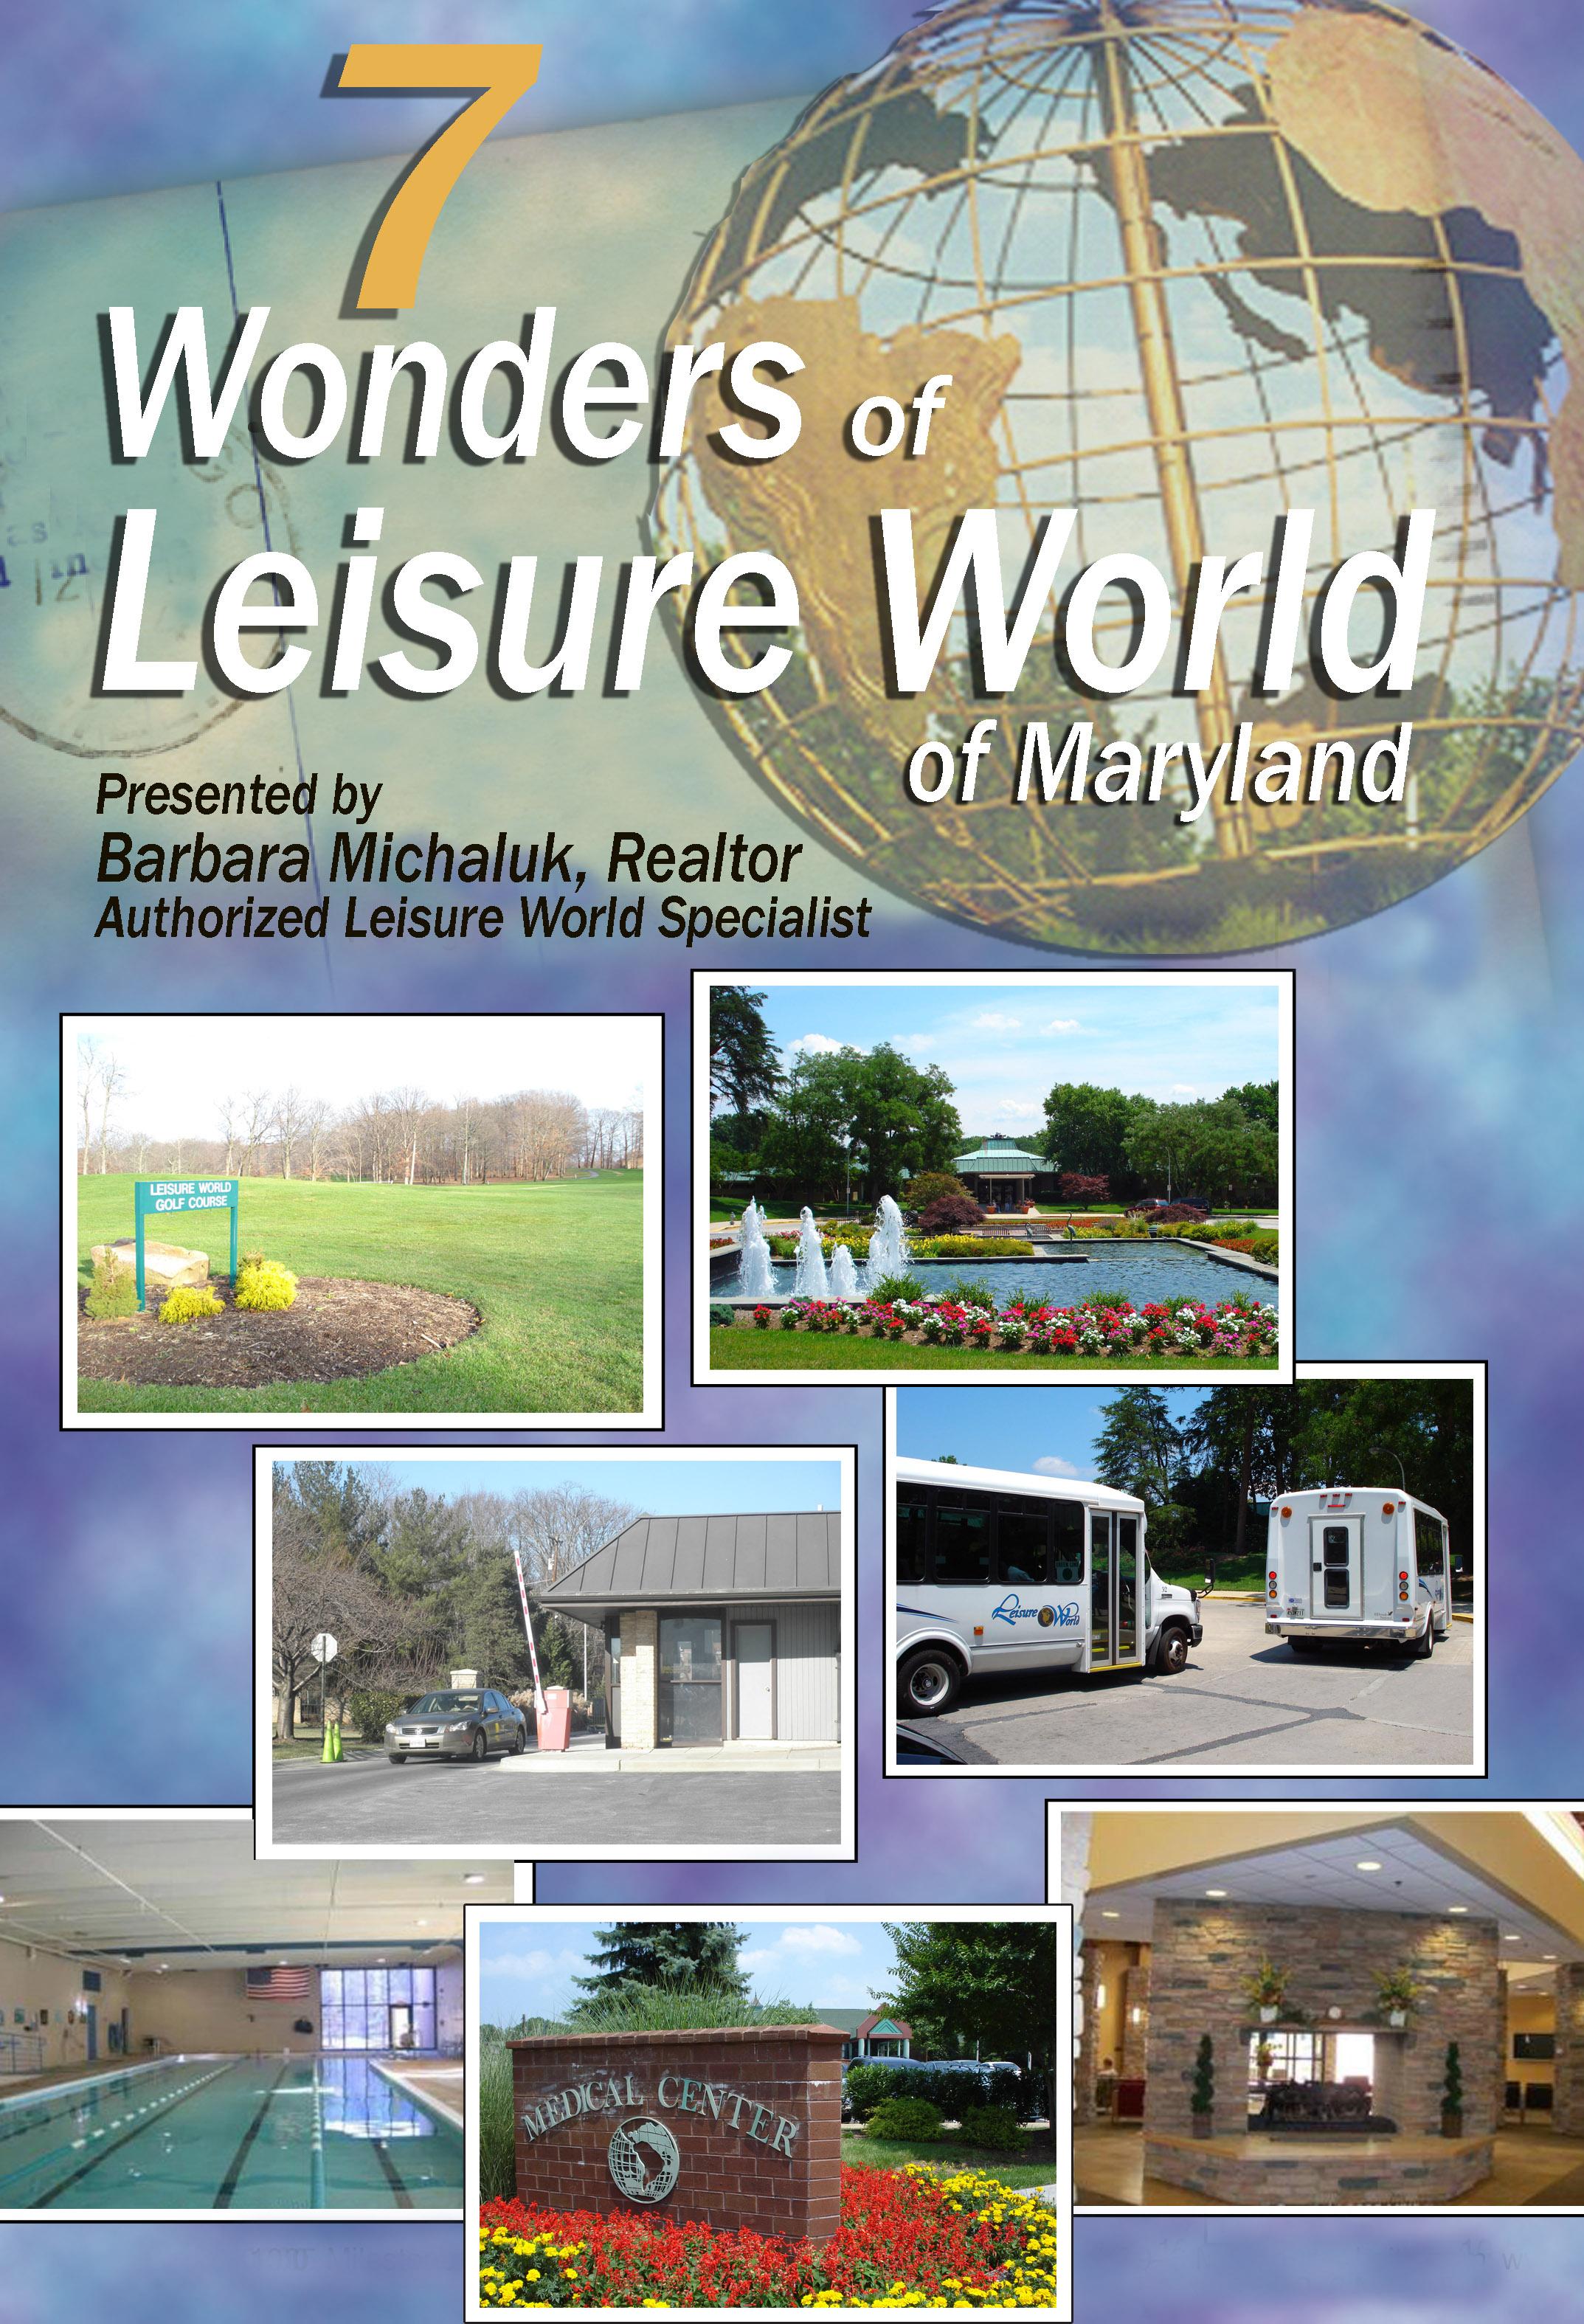 Leisure World Wonders Barbara Michaluk Realtor